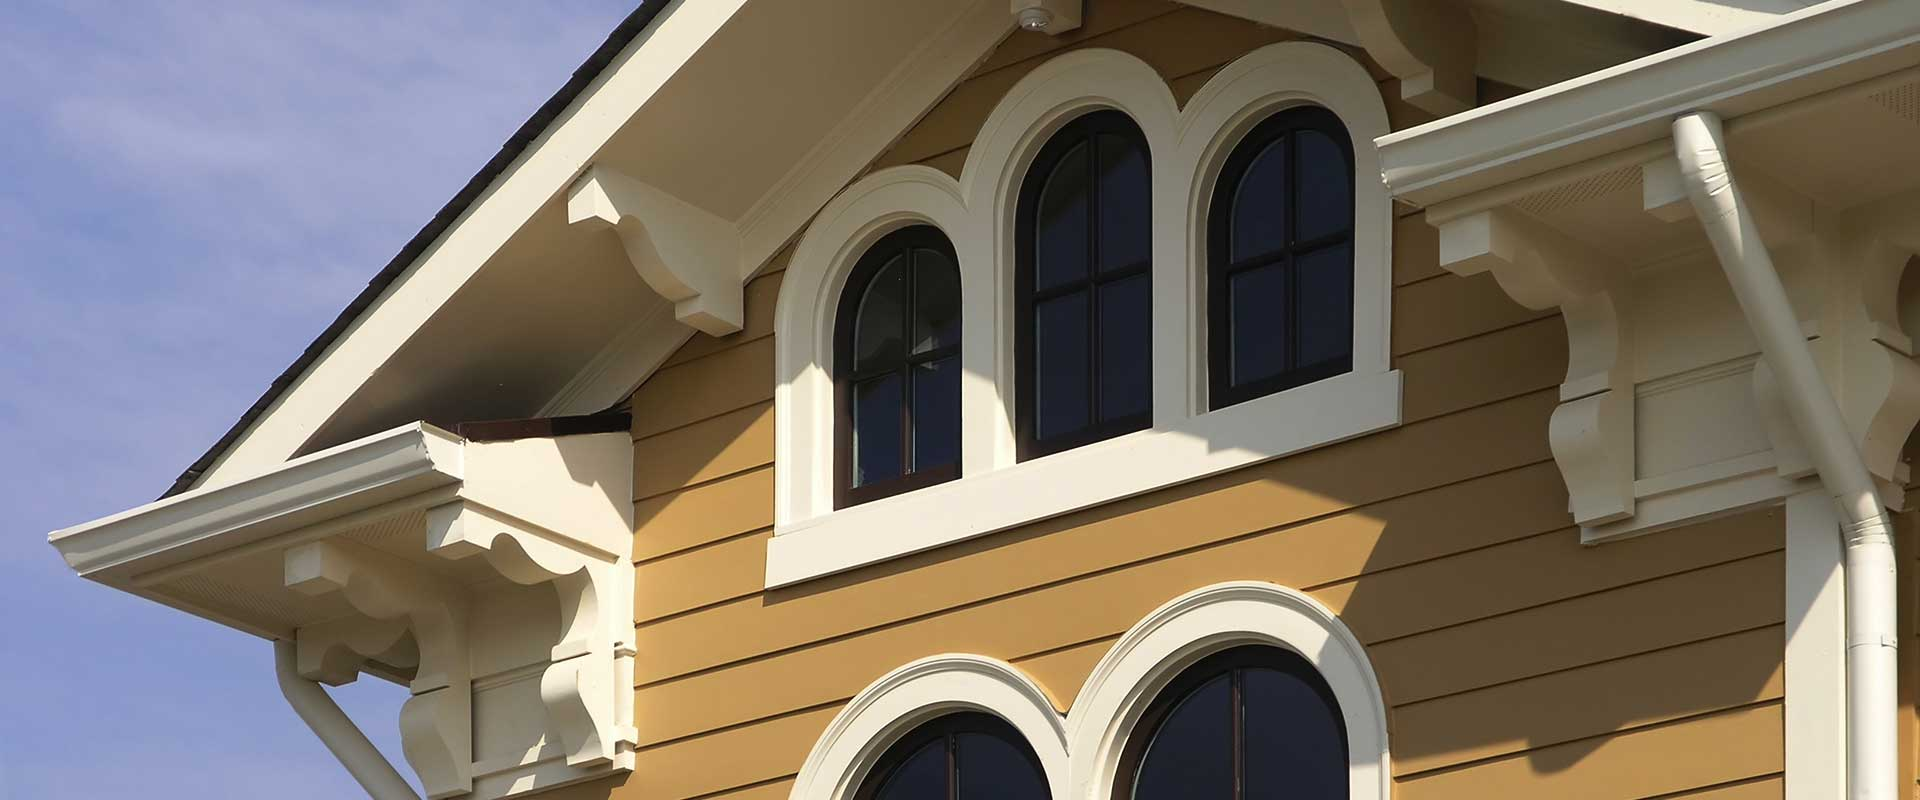 Как покрасить фасад дома своими руками : фото, подготовка фасада 65